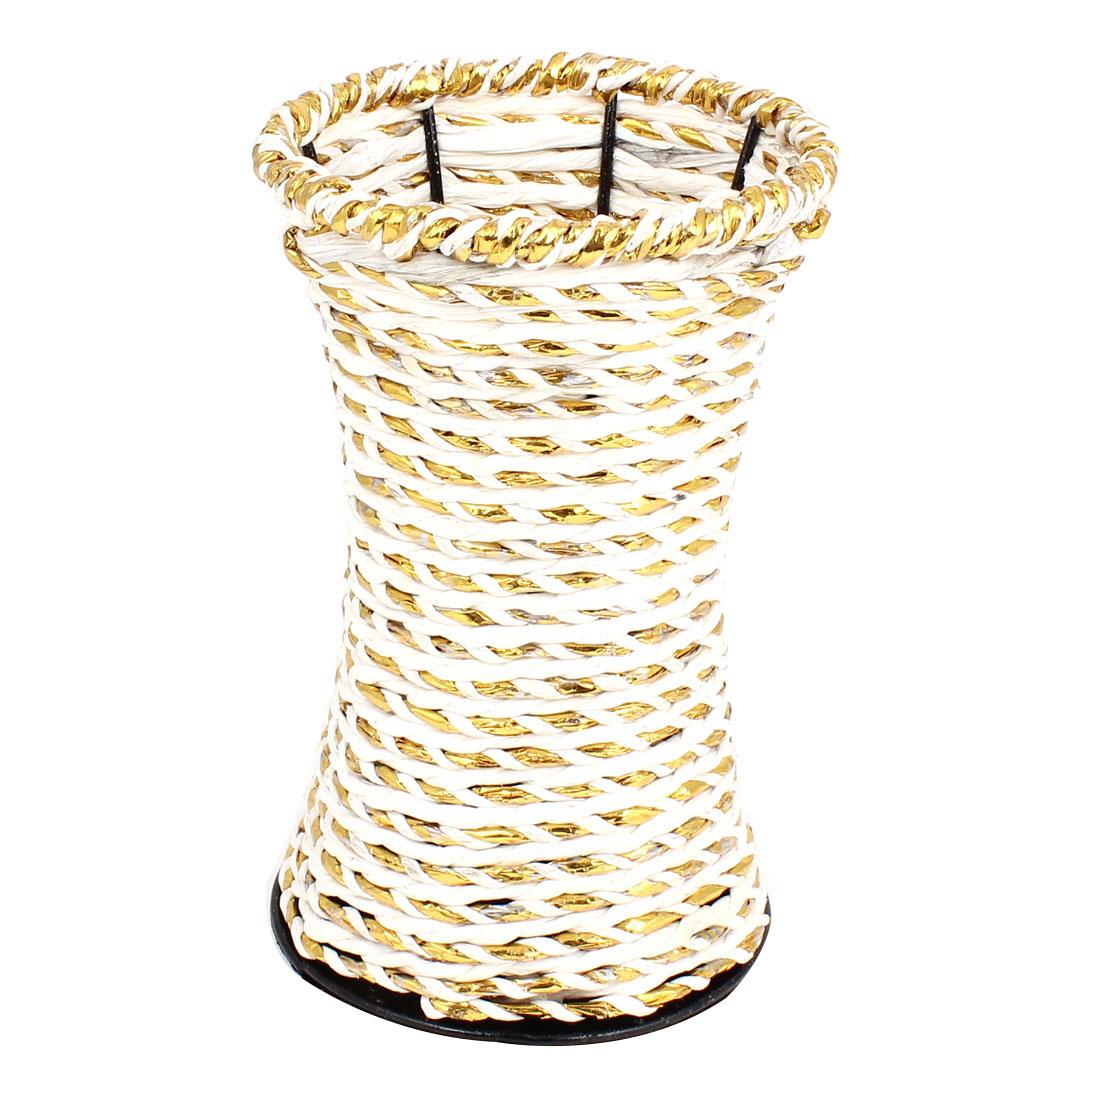 Metal Frame Gold Tone White Weave Craft Manmade Flowers Basket Holder